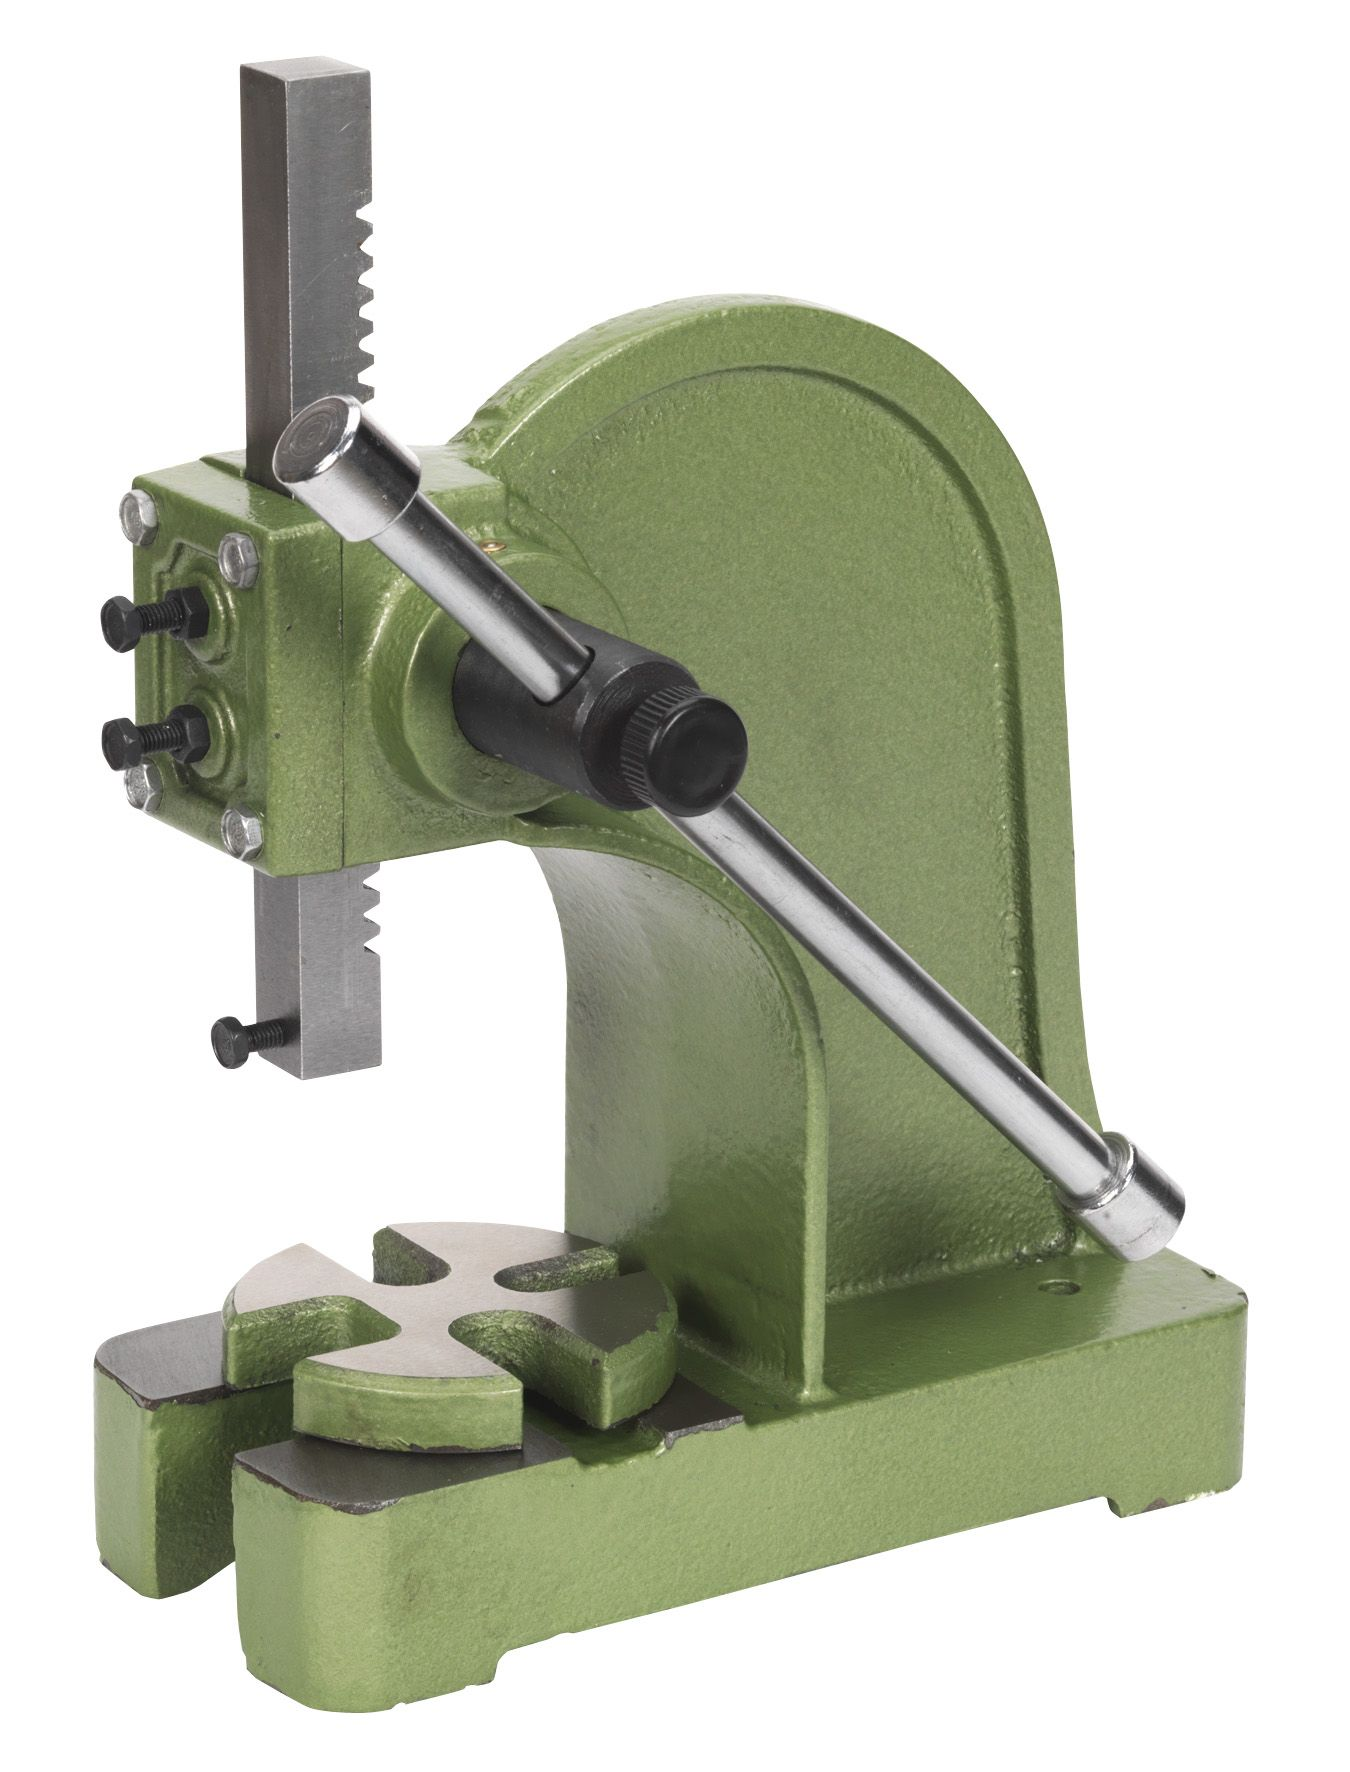 Sealey Arbor Press 0.5tonne